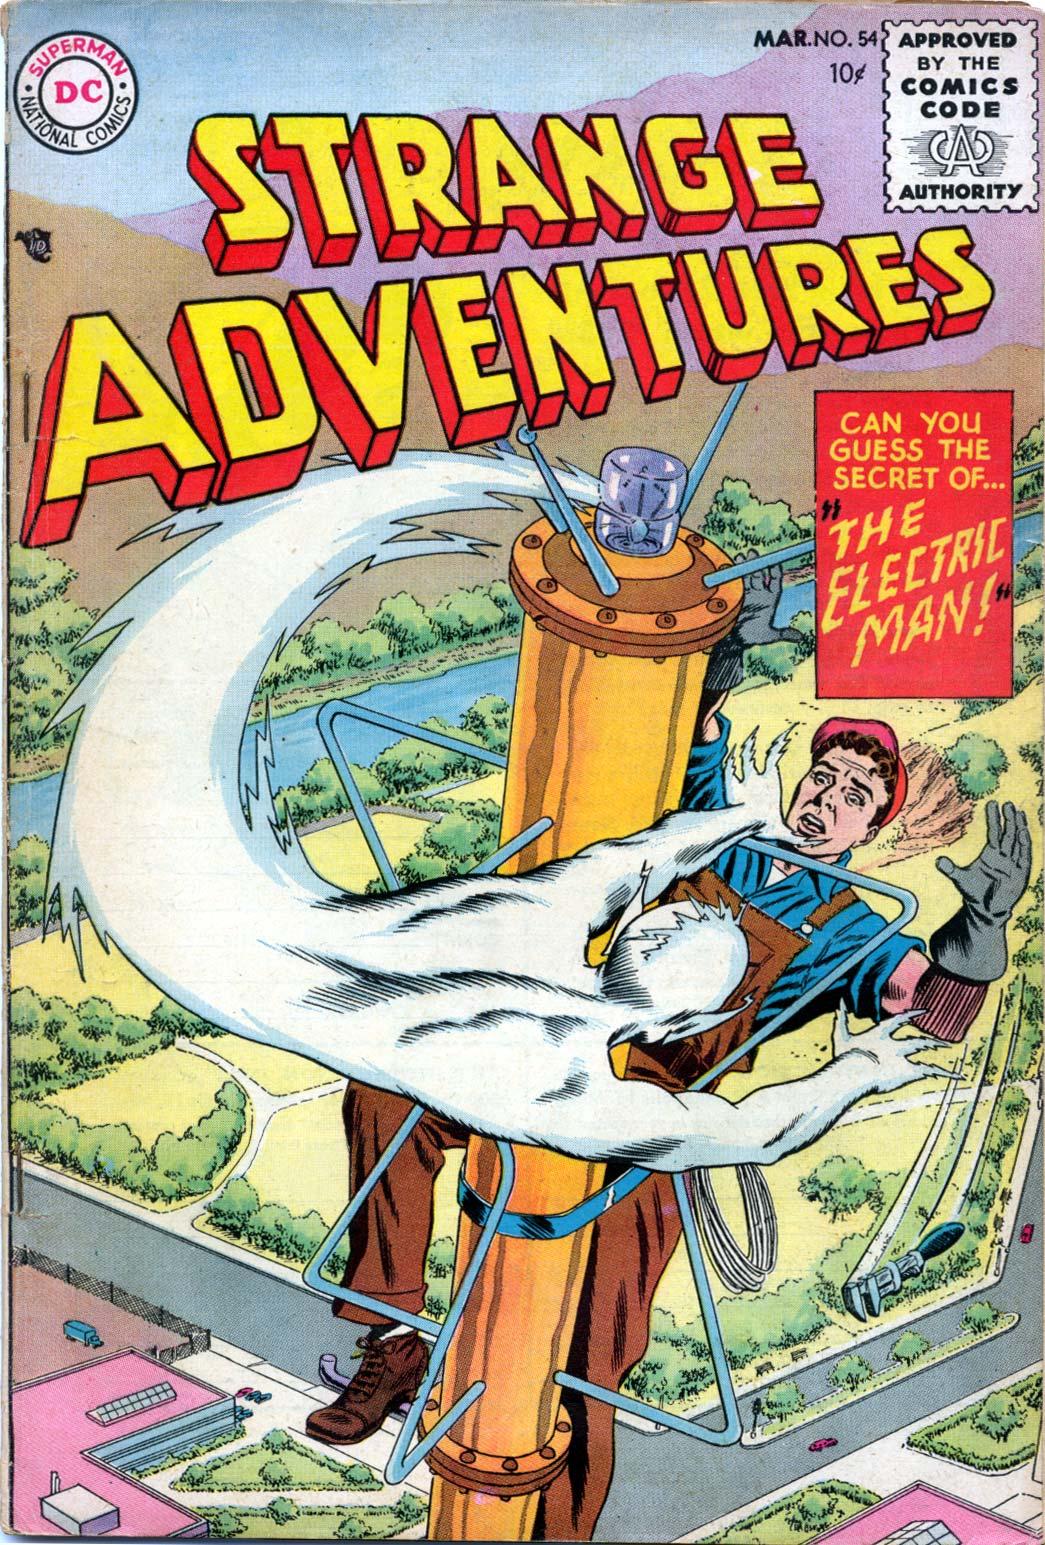 Strange Adventures (1950) issue 54 - Page 1